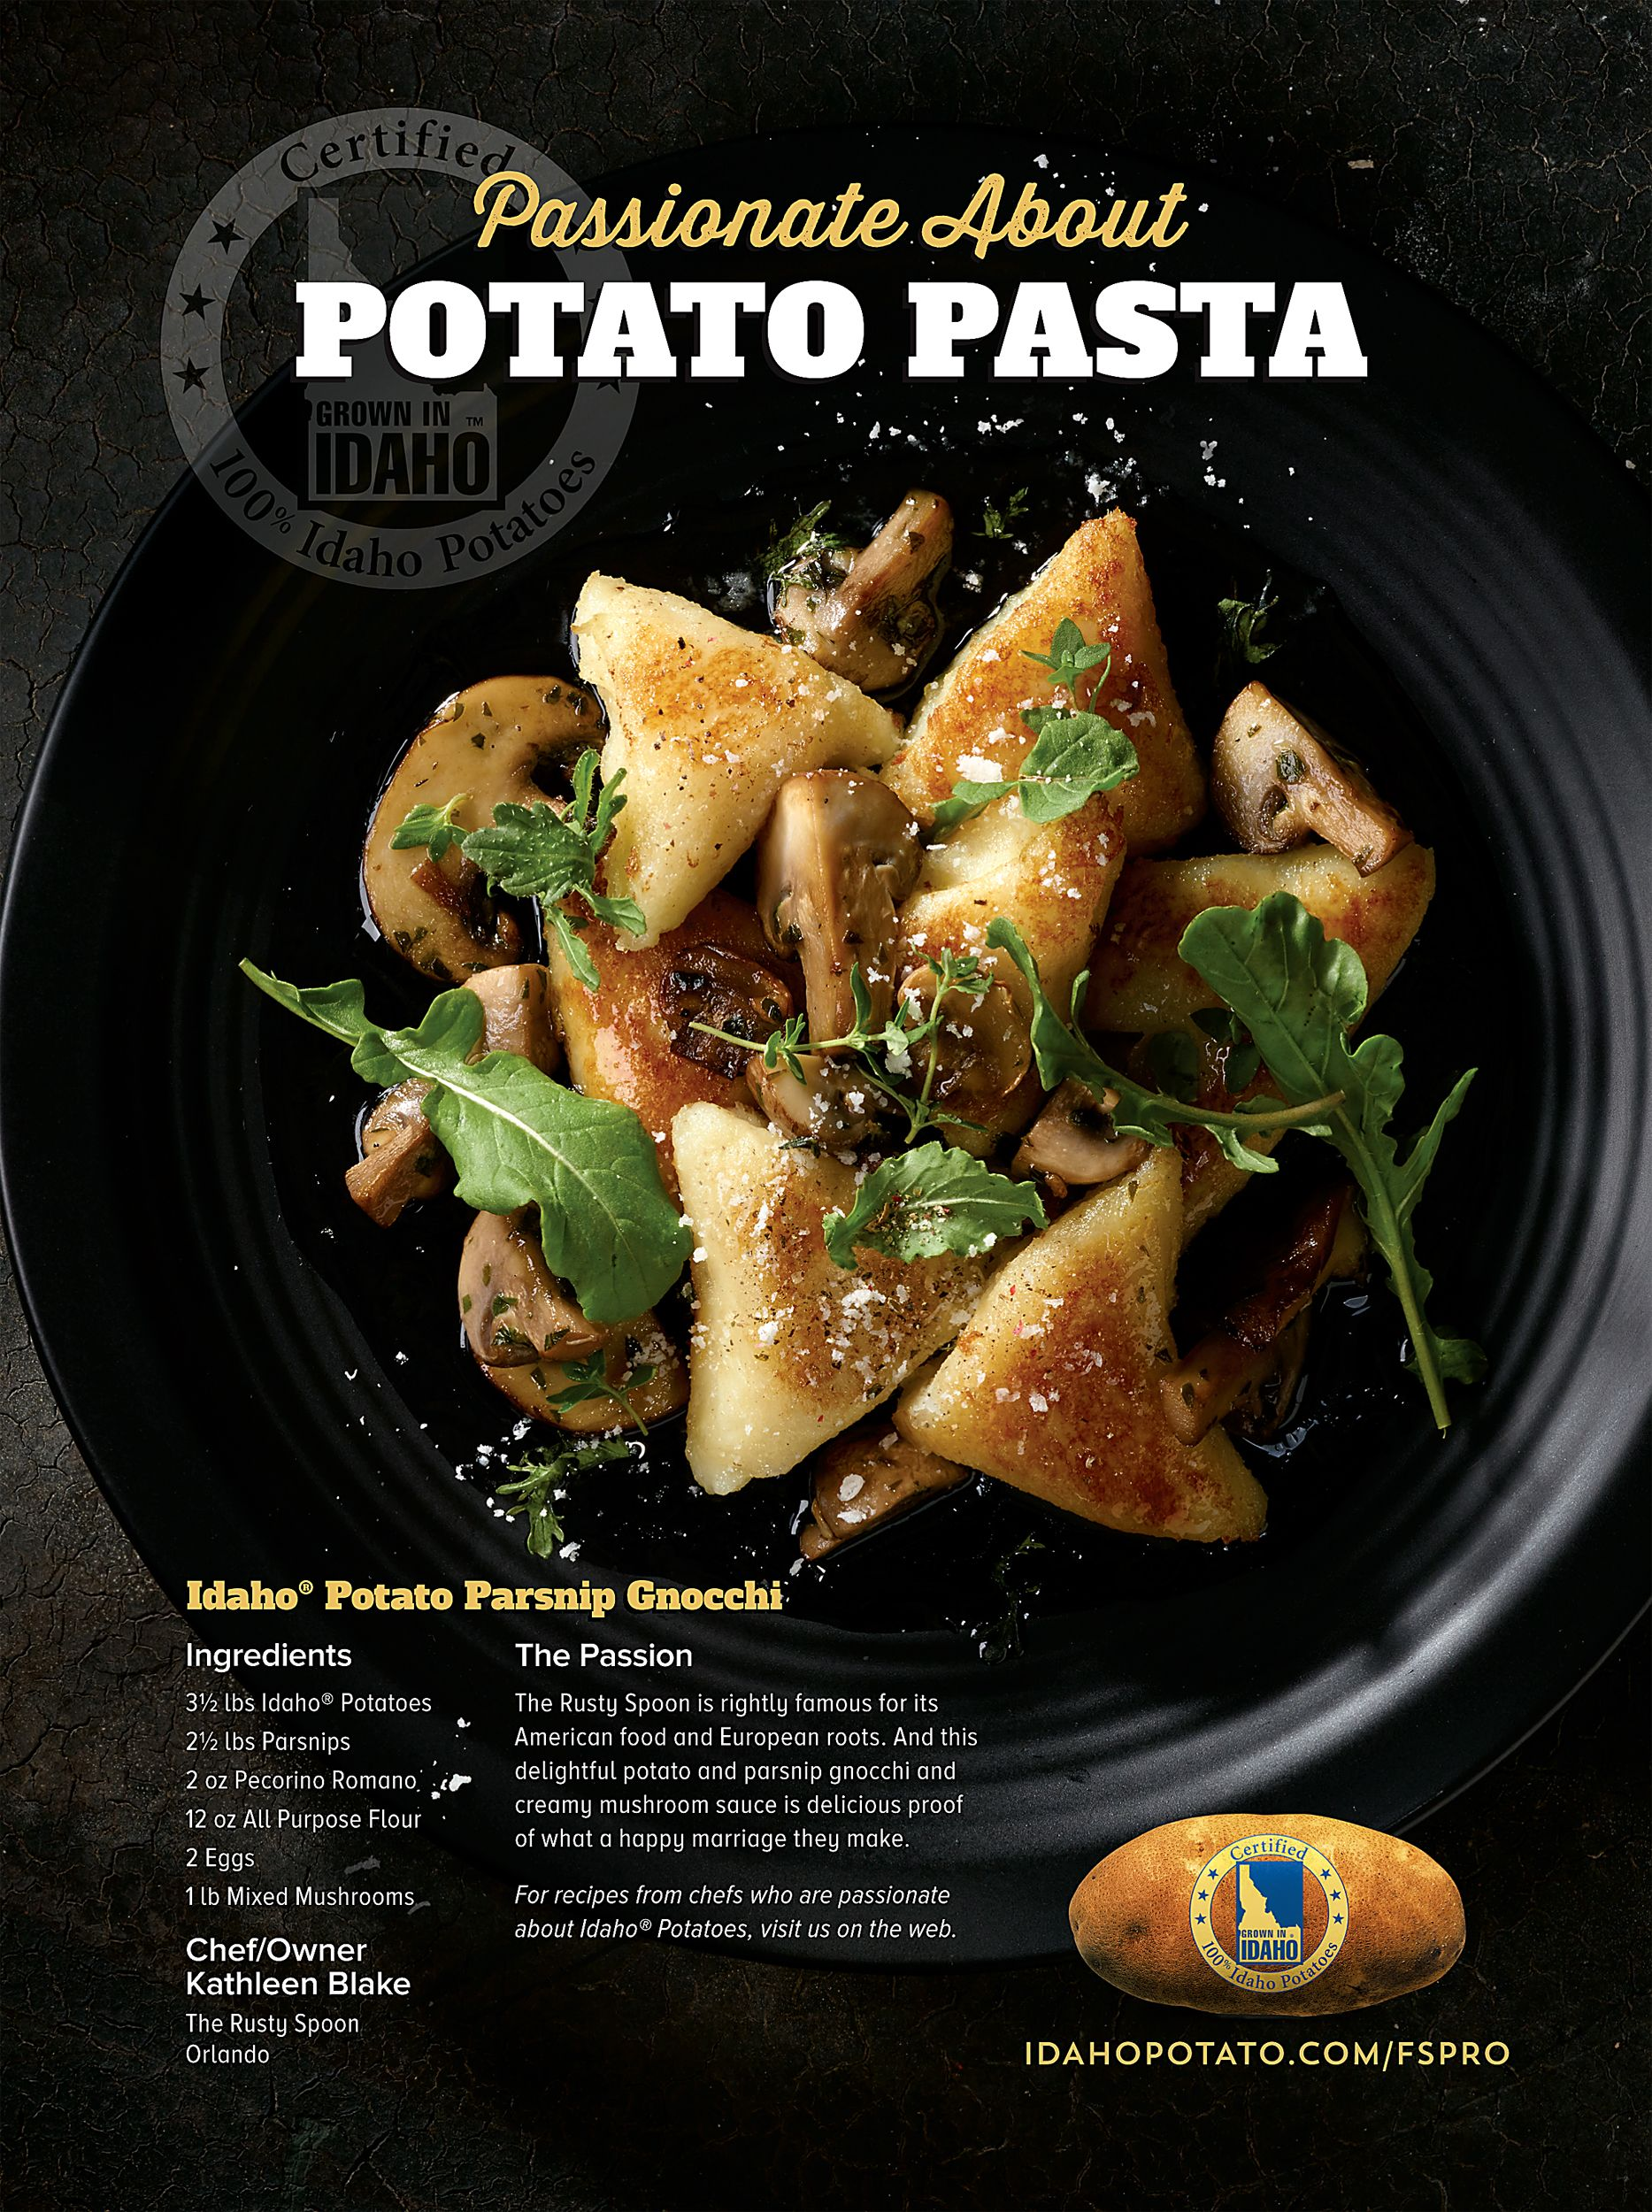 IPC-G0353d-potato-pasta-8x10.jpg